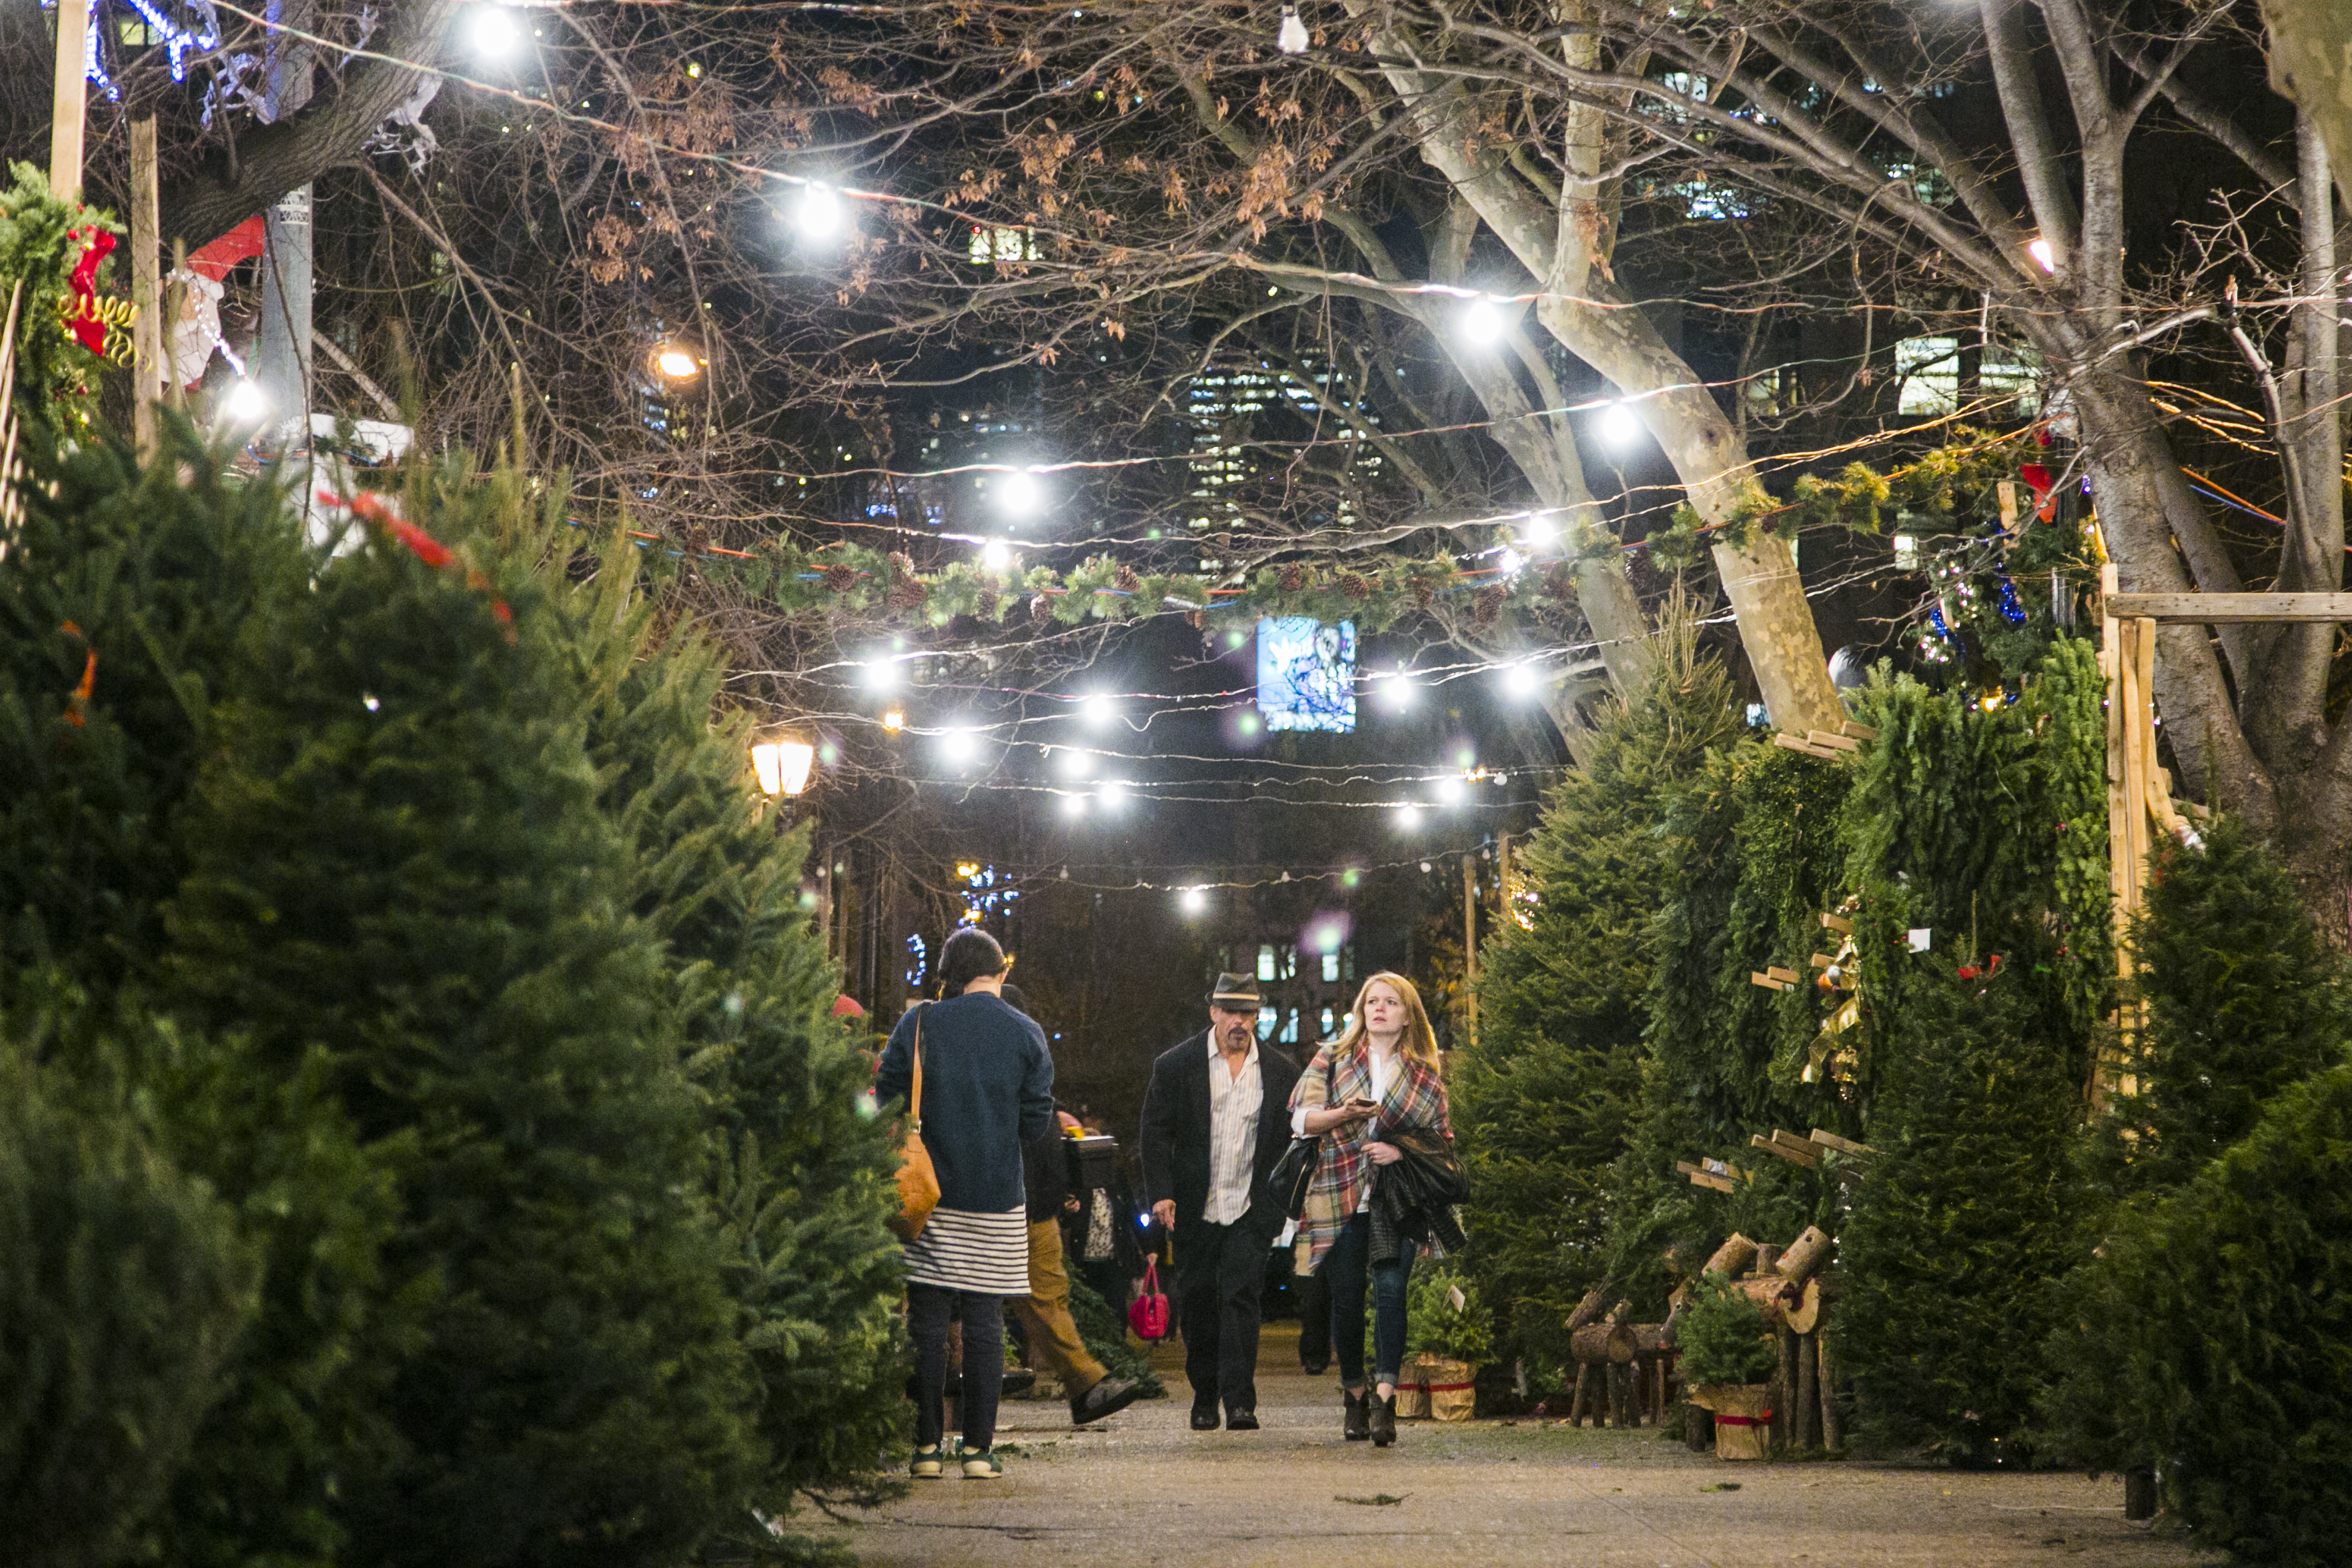 A Peek Behind The Curtain At New York S Christmas Tree Trade